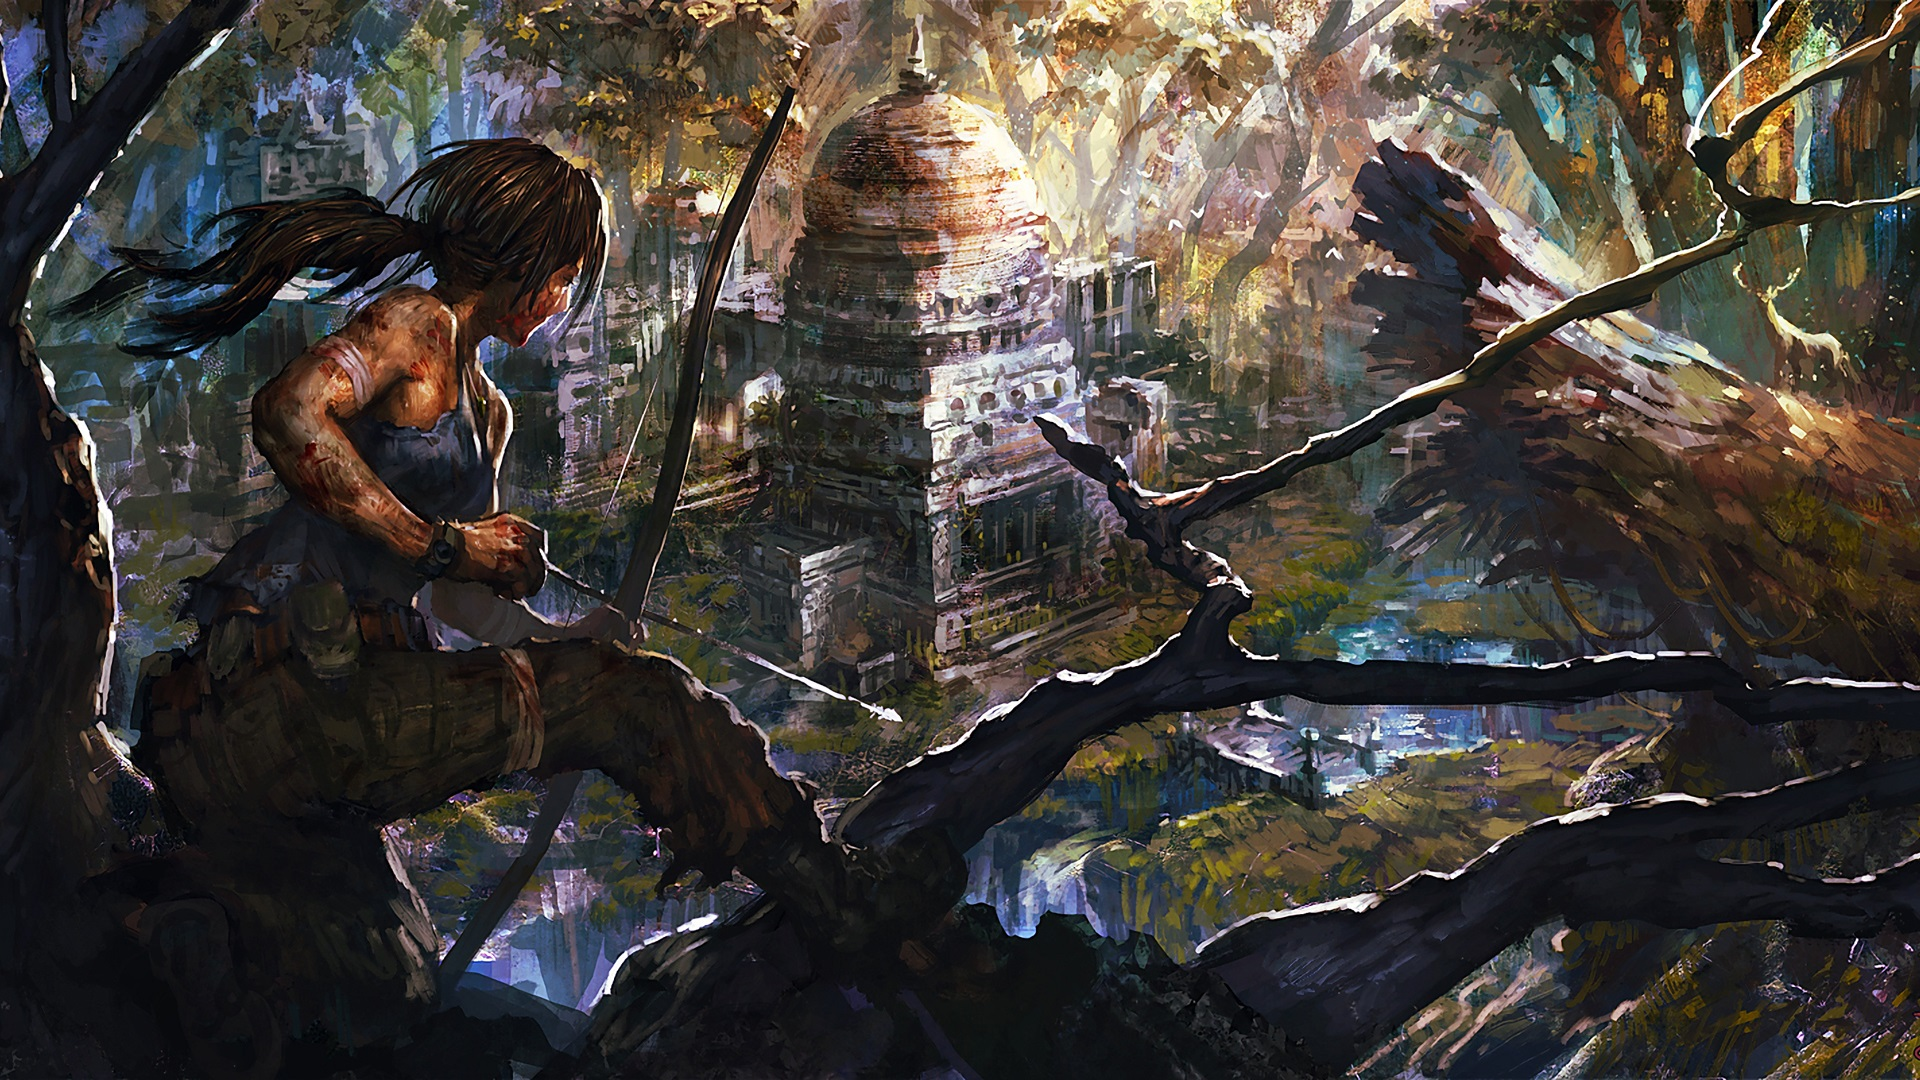 7680x4320 Lara Croft 8k Artwork 8k Hd 4k Wallpapers: Papéis De Parede Desenho De Arte, Tomb Raider, Lara Croft